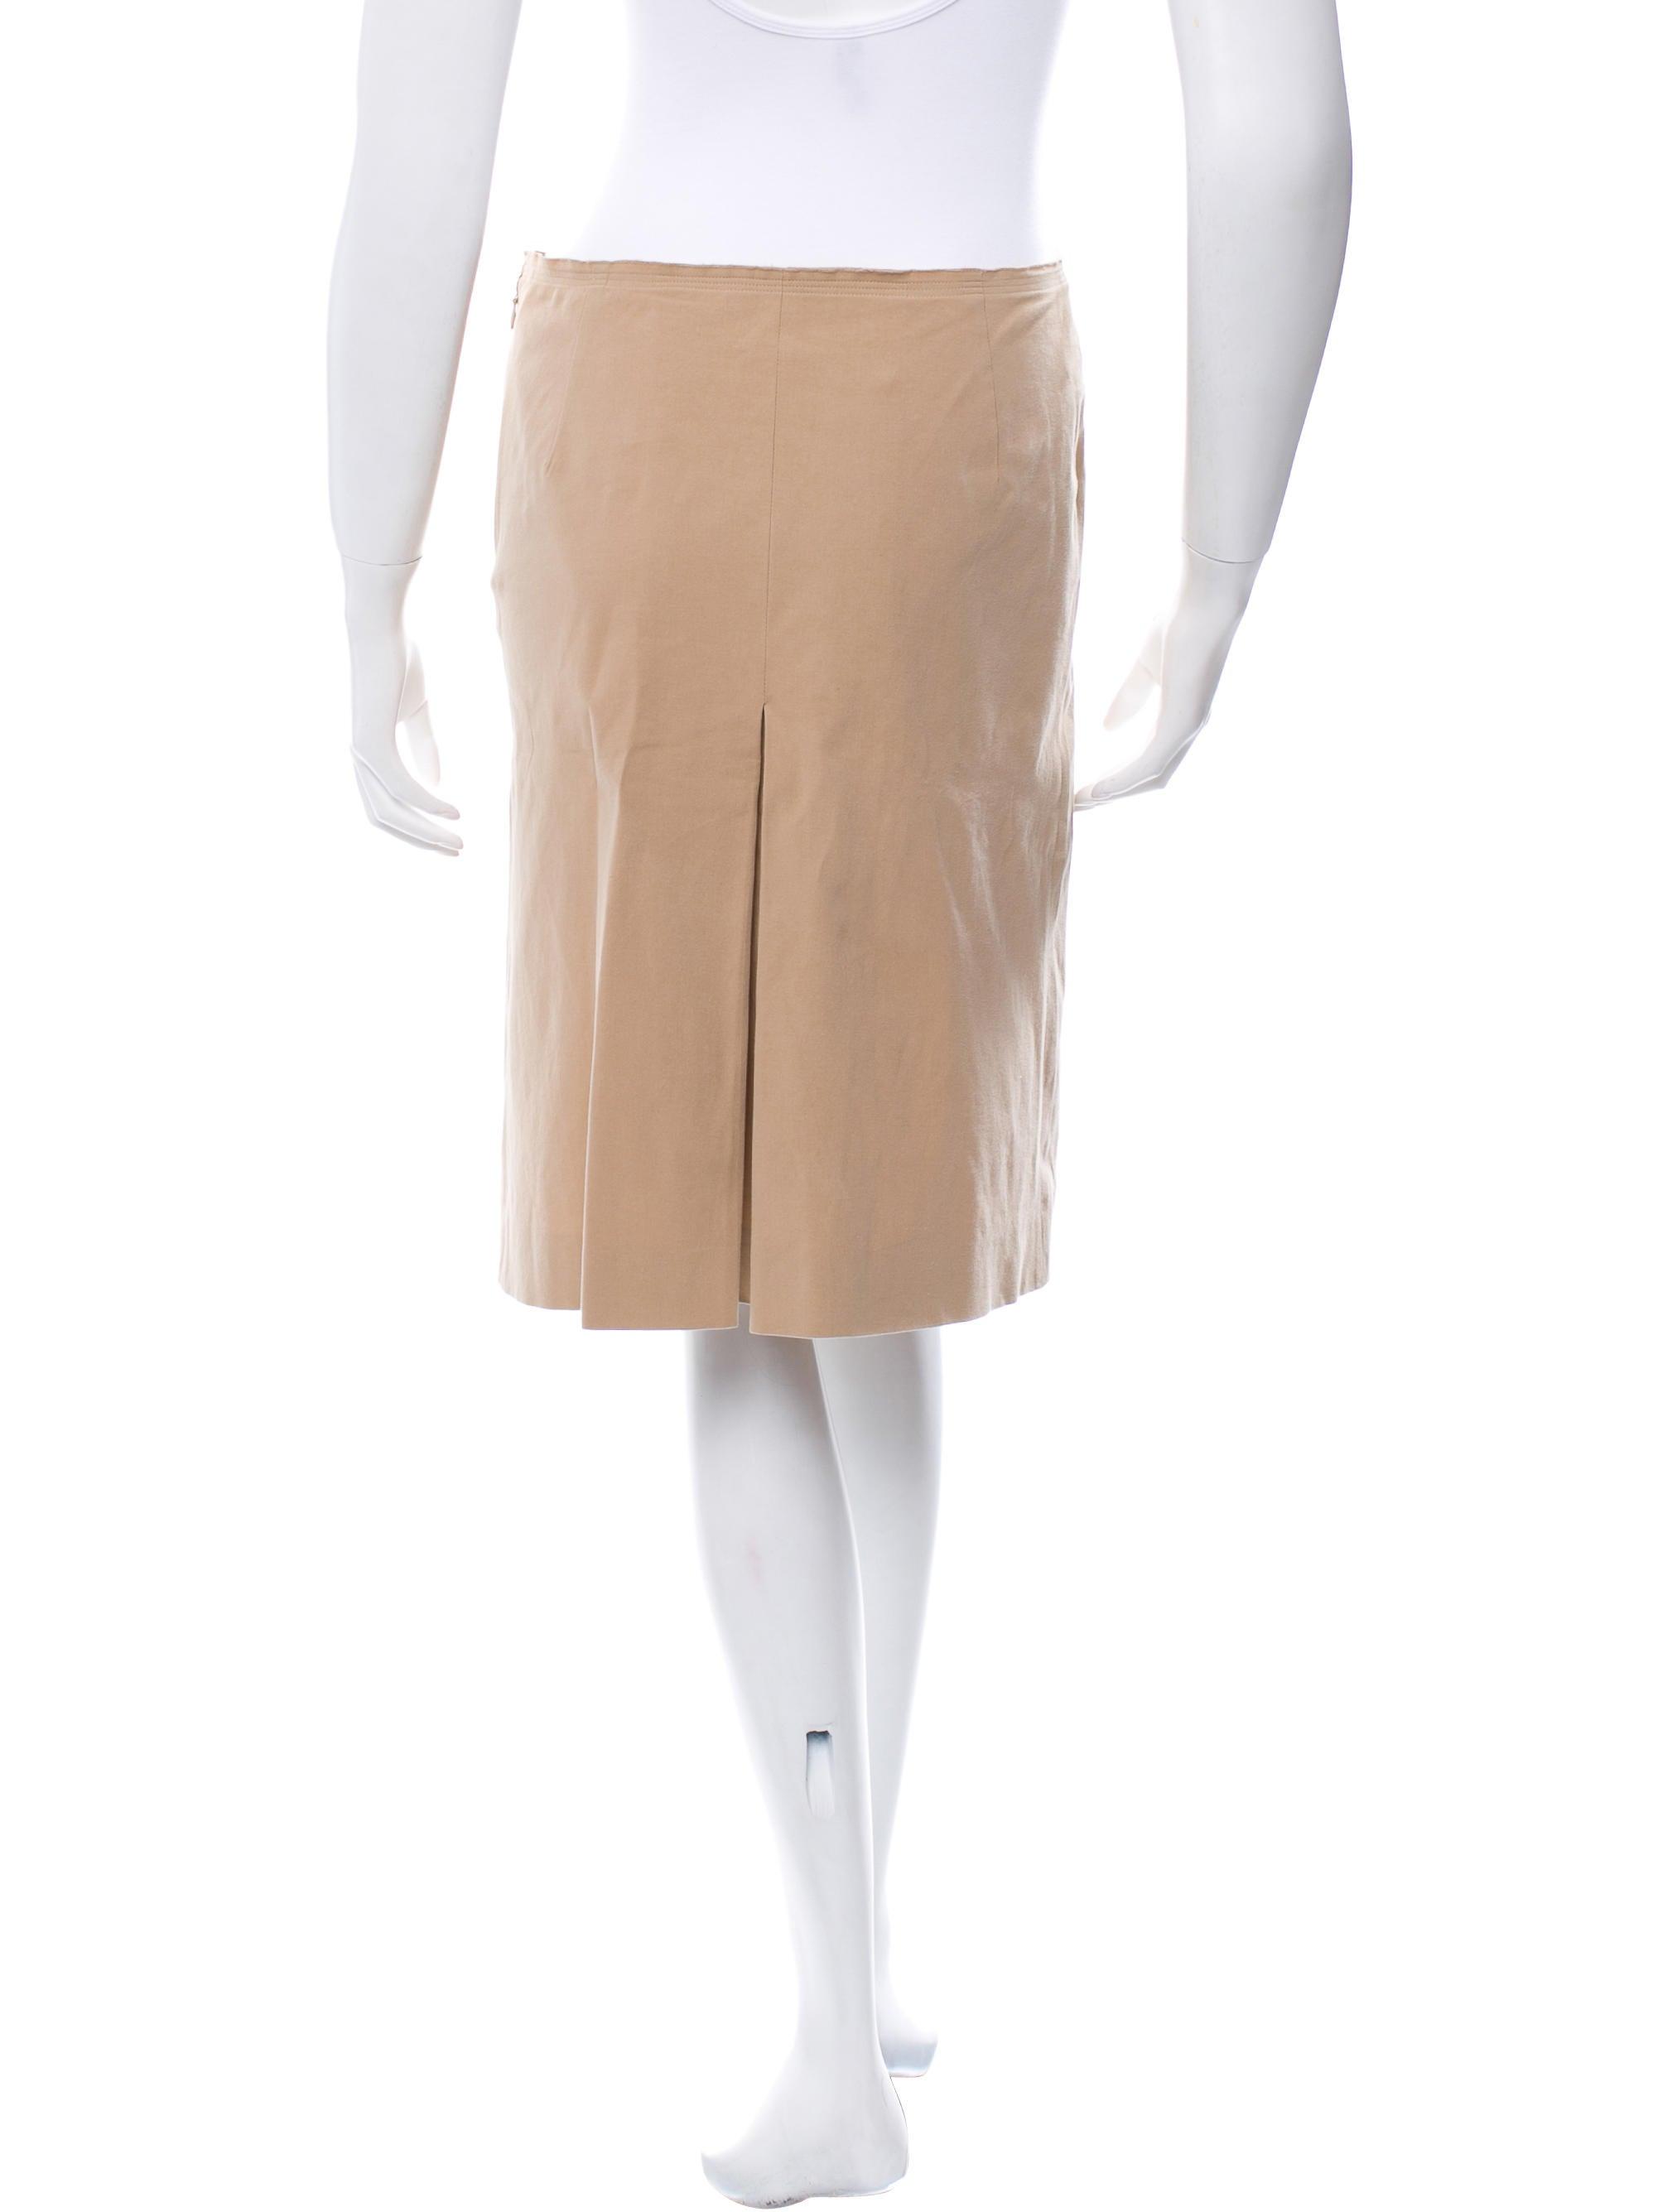 prada a line knee length skirt skirts pra98605 the